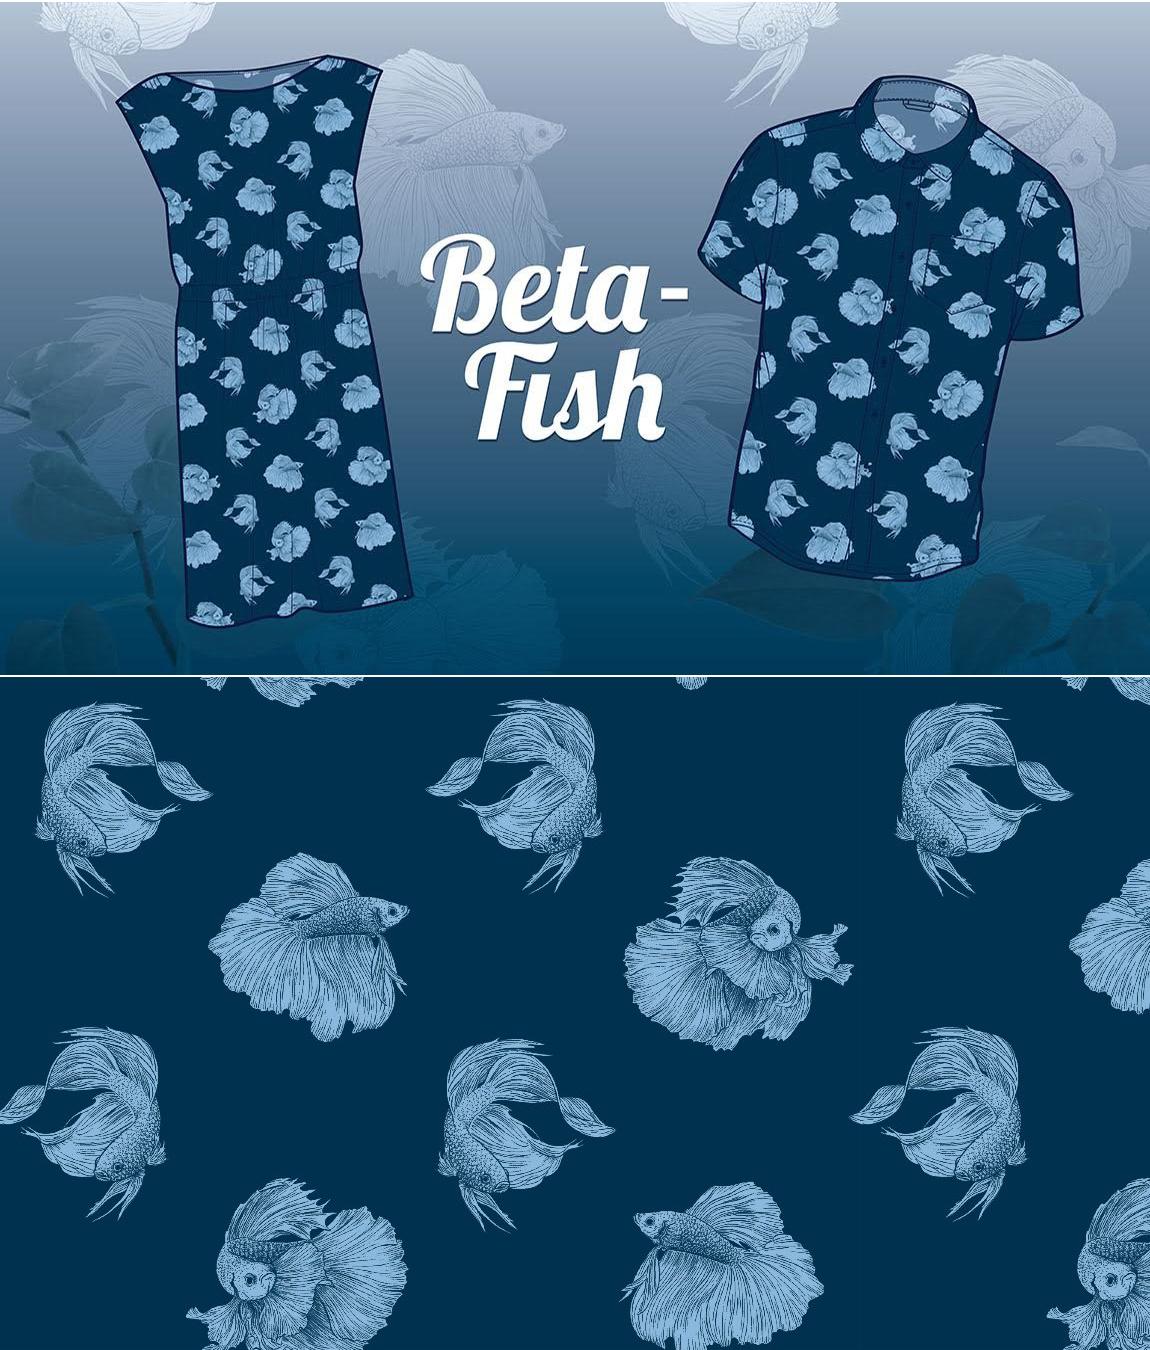 Betafish Pattern by Chris Cerrato